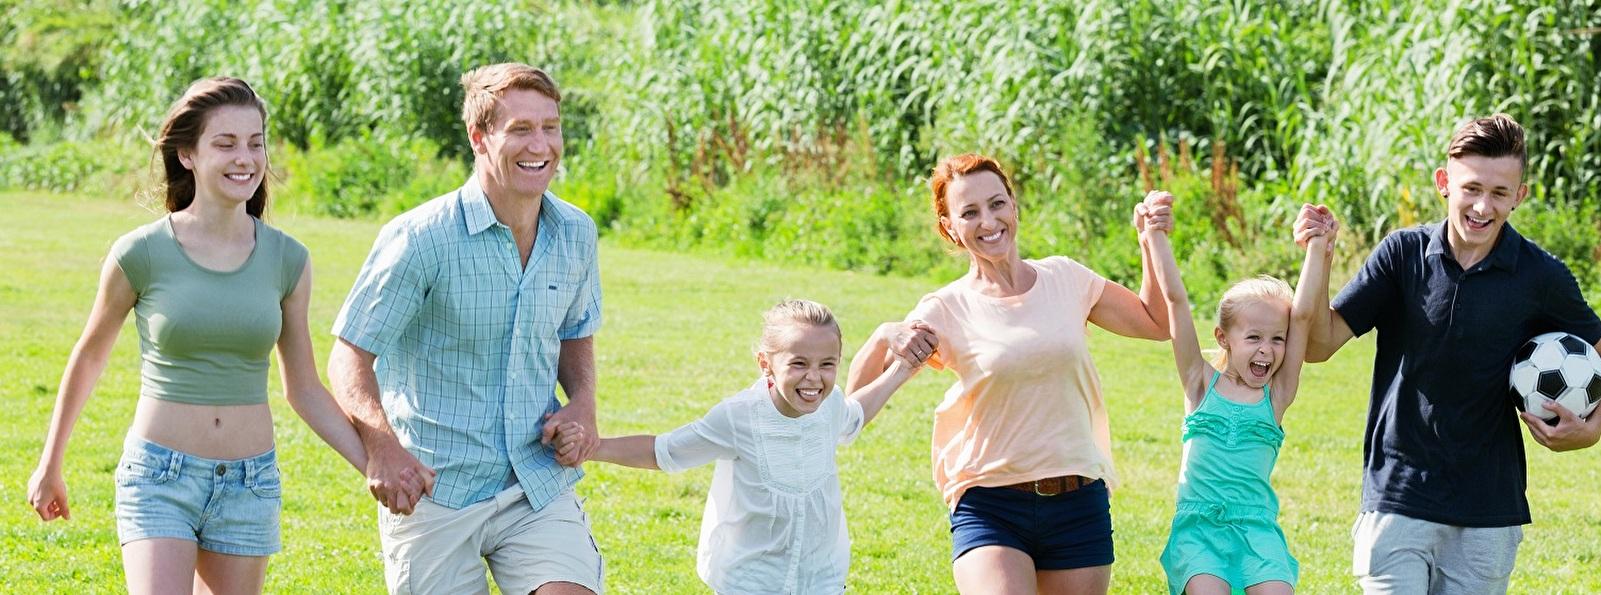 Bild zum Thema Kinder Jugend Familie